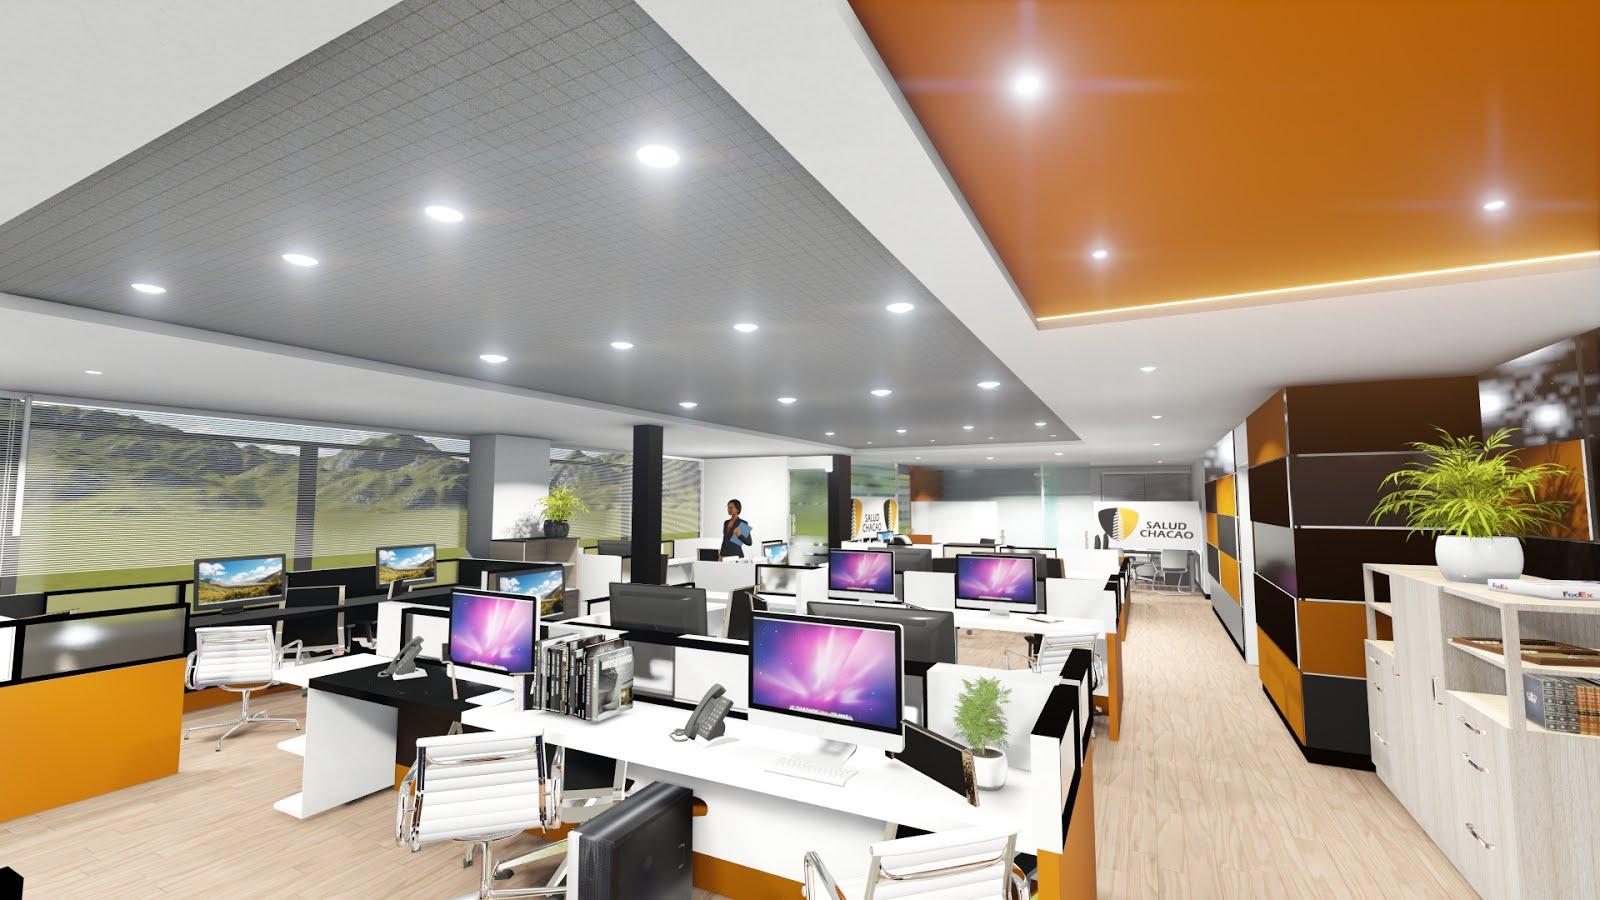 Arquitectura creativa blog tips para remodelar for Decoracion de oficinas creativas